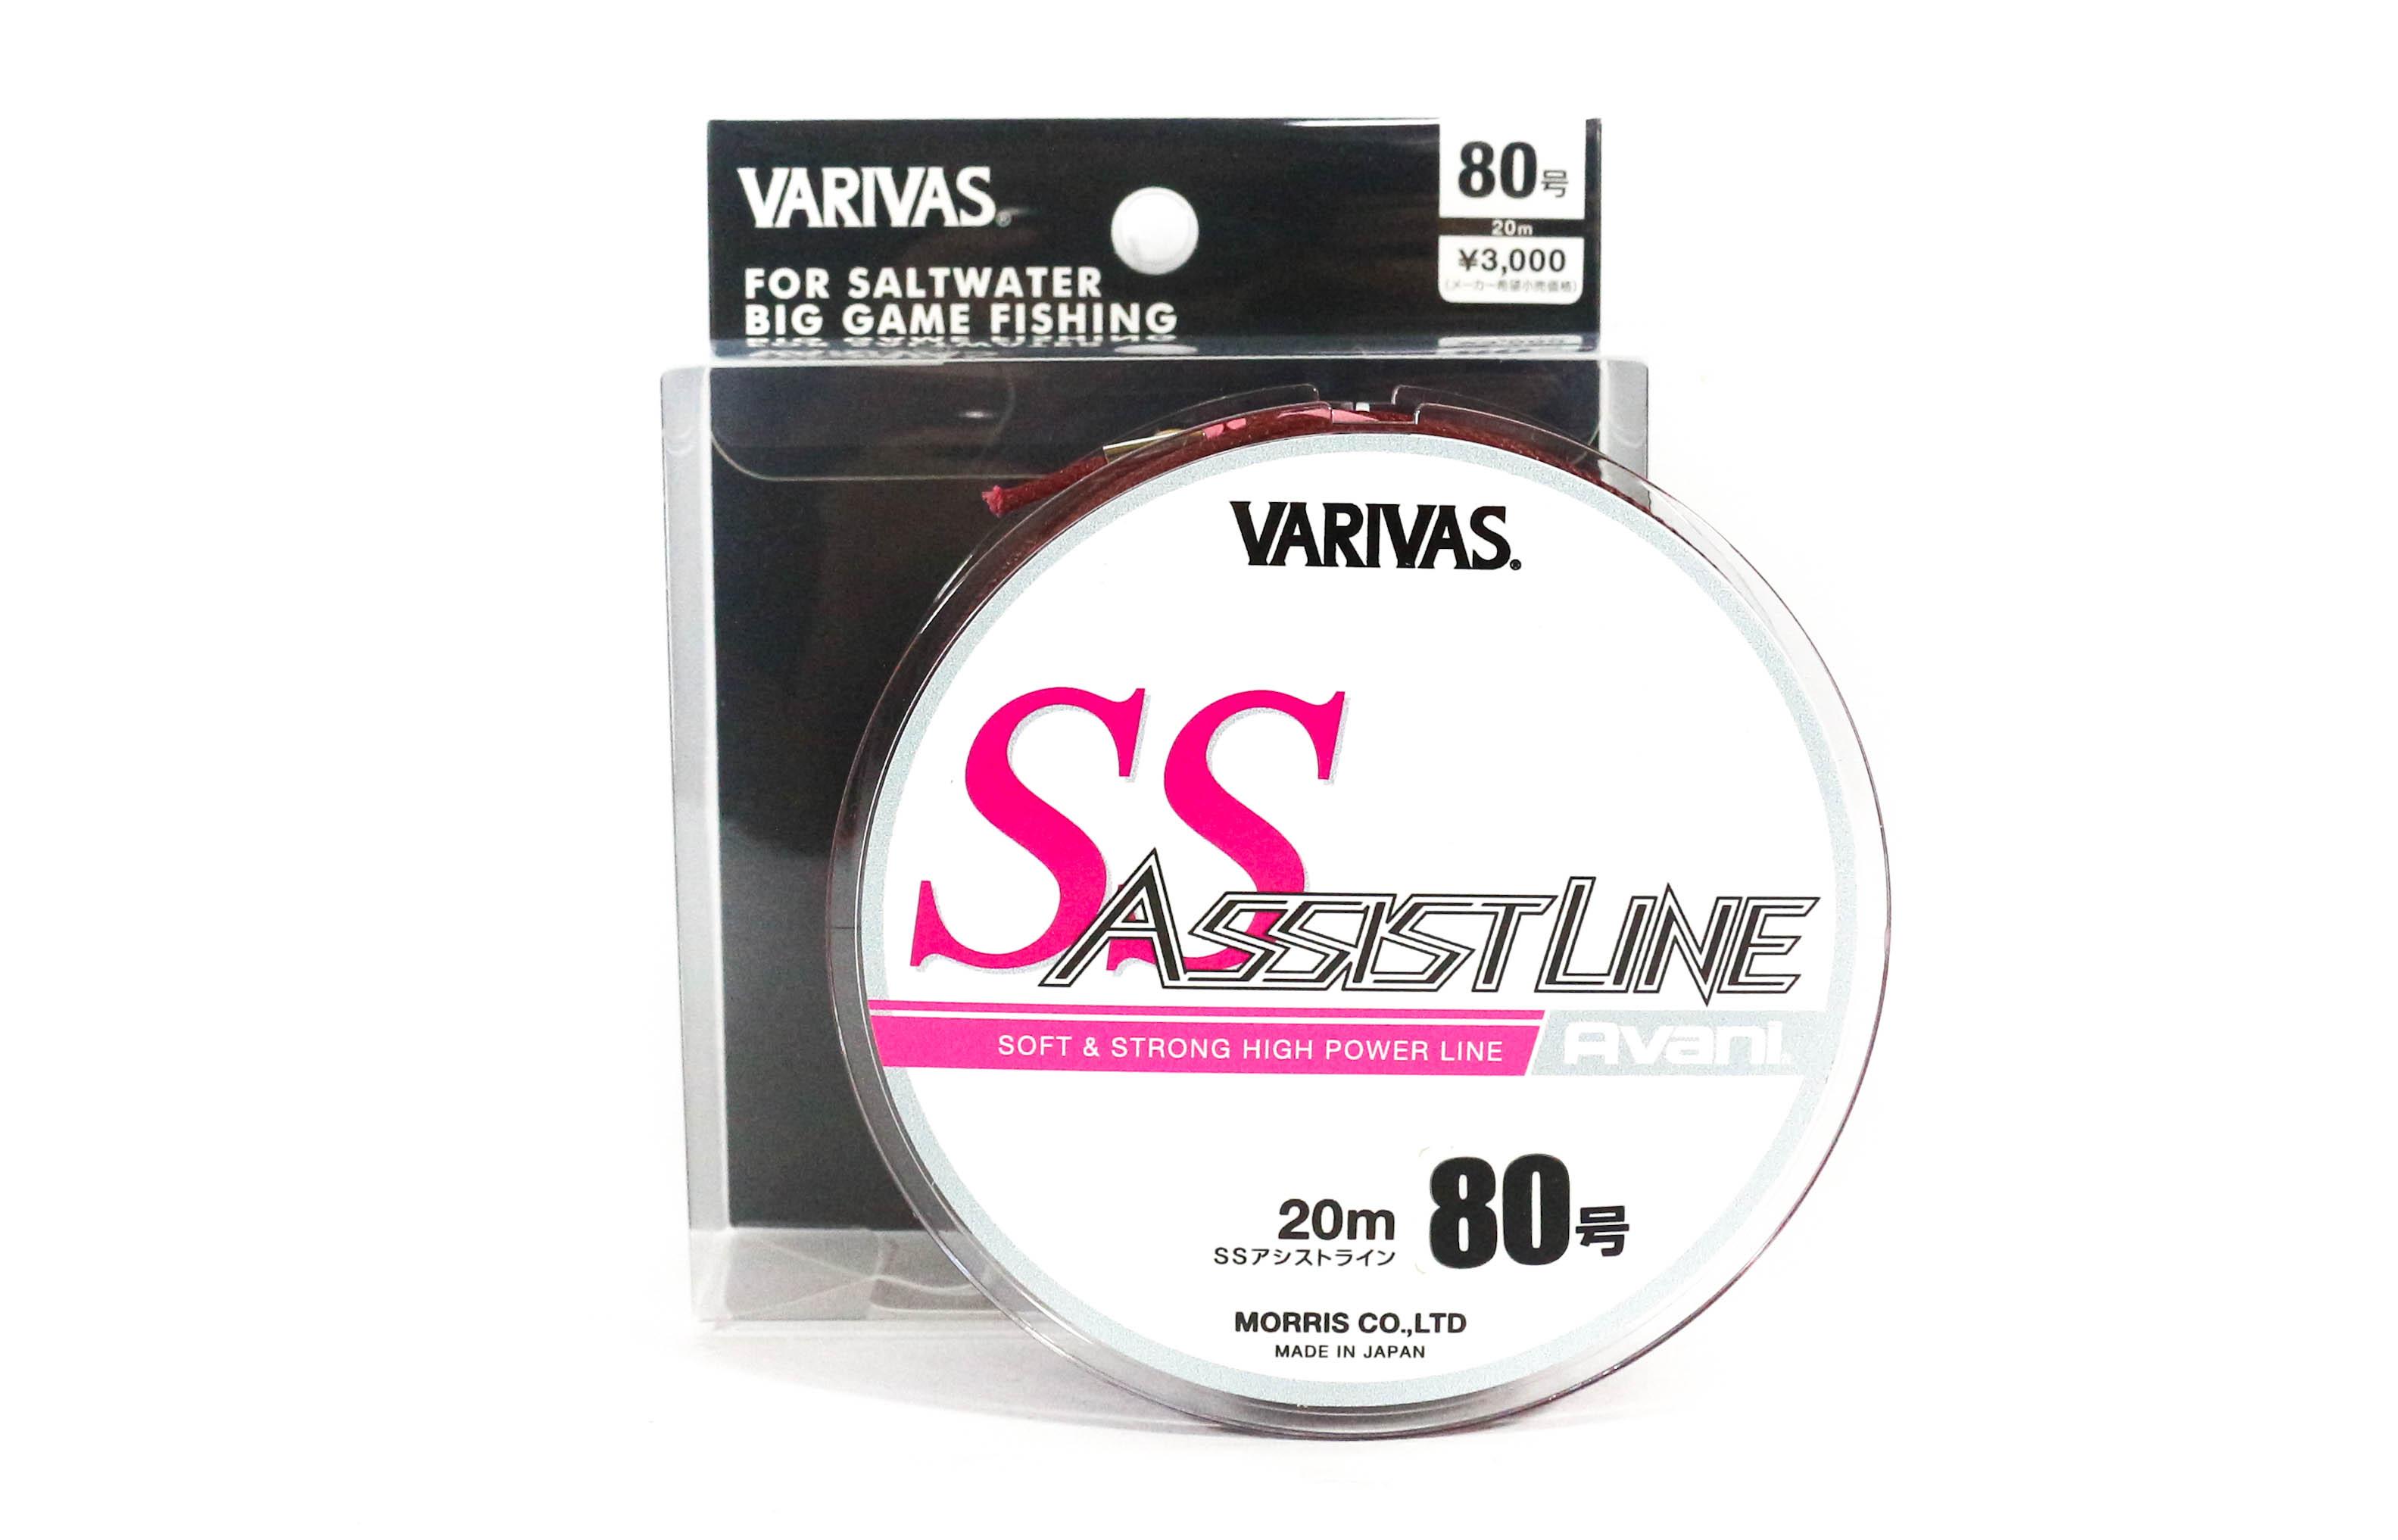 Varivas SS Assist Line 20m #80 330lb (3512)